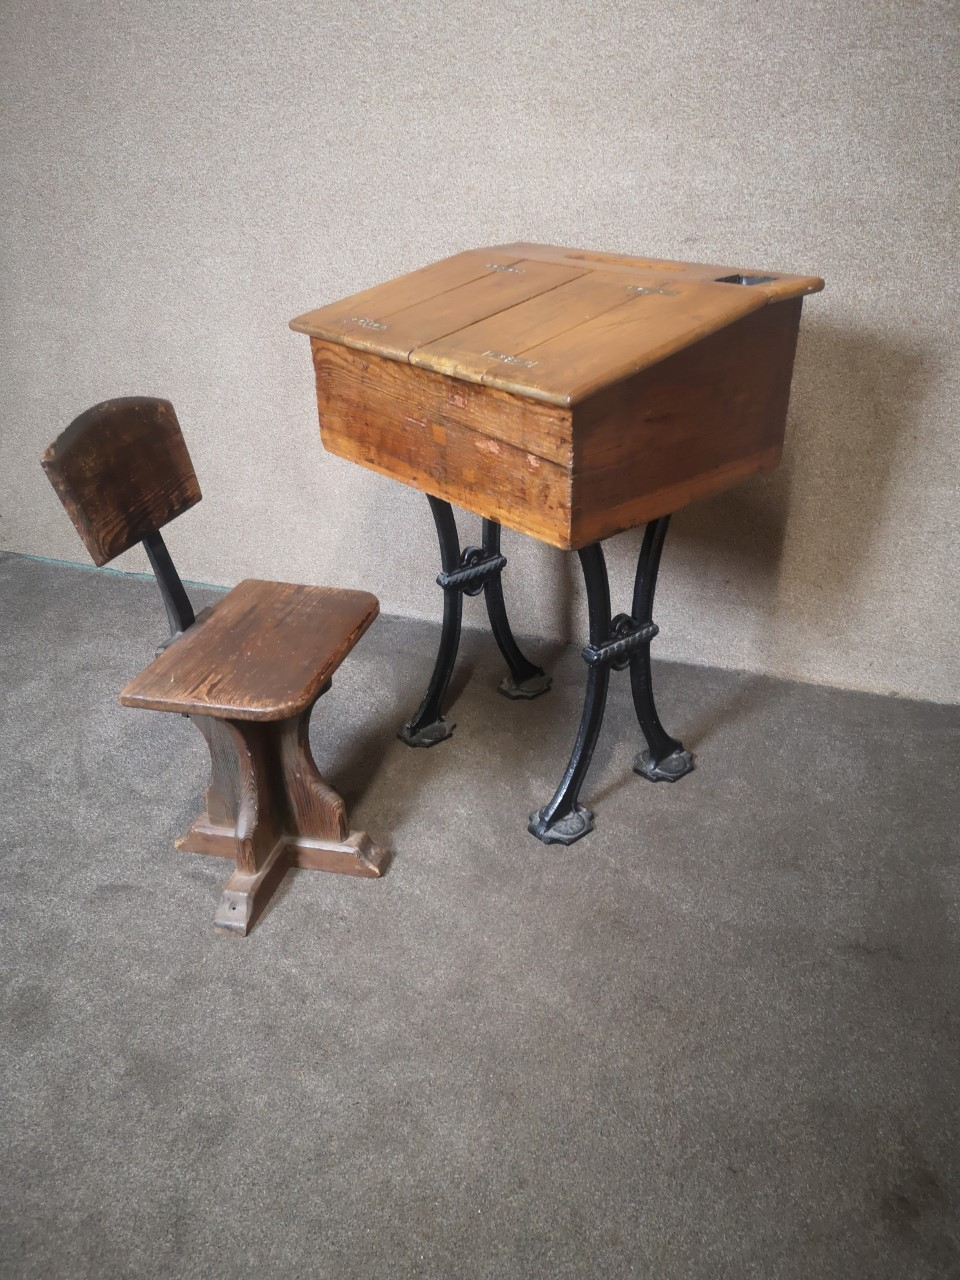 School desk and chair画像